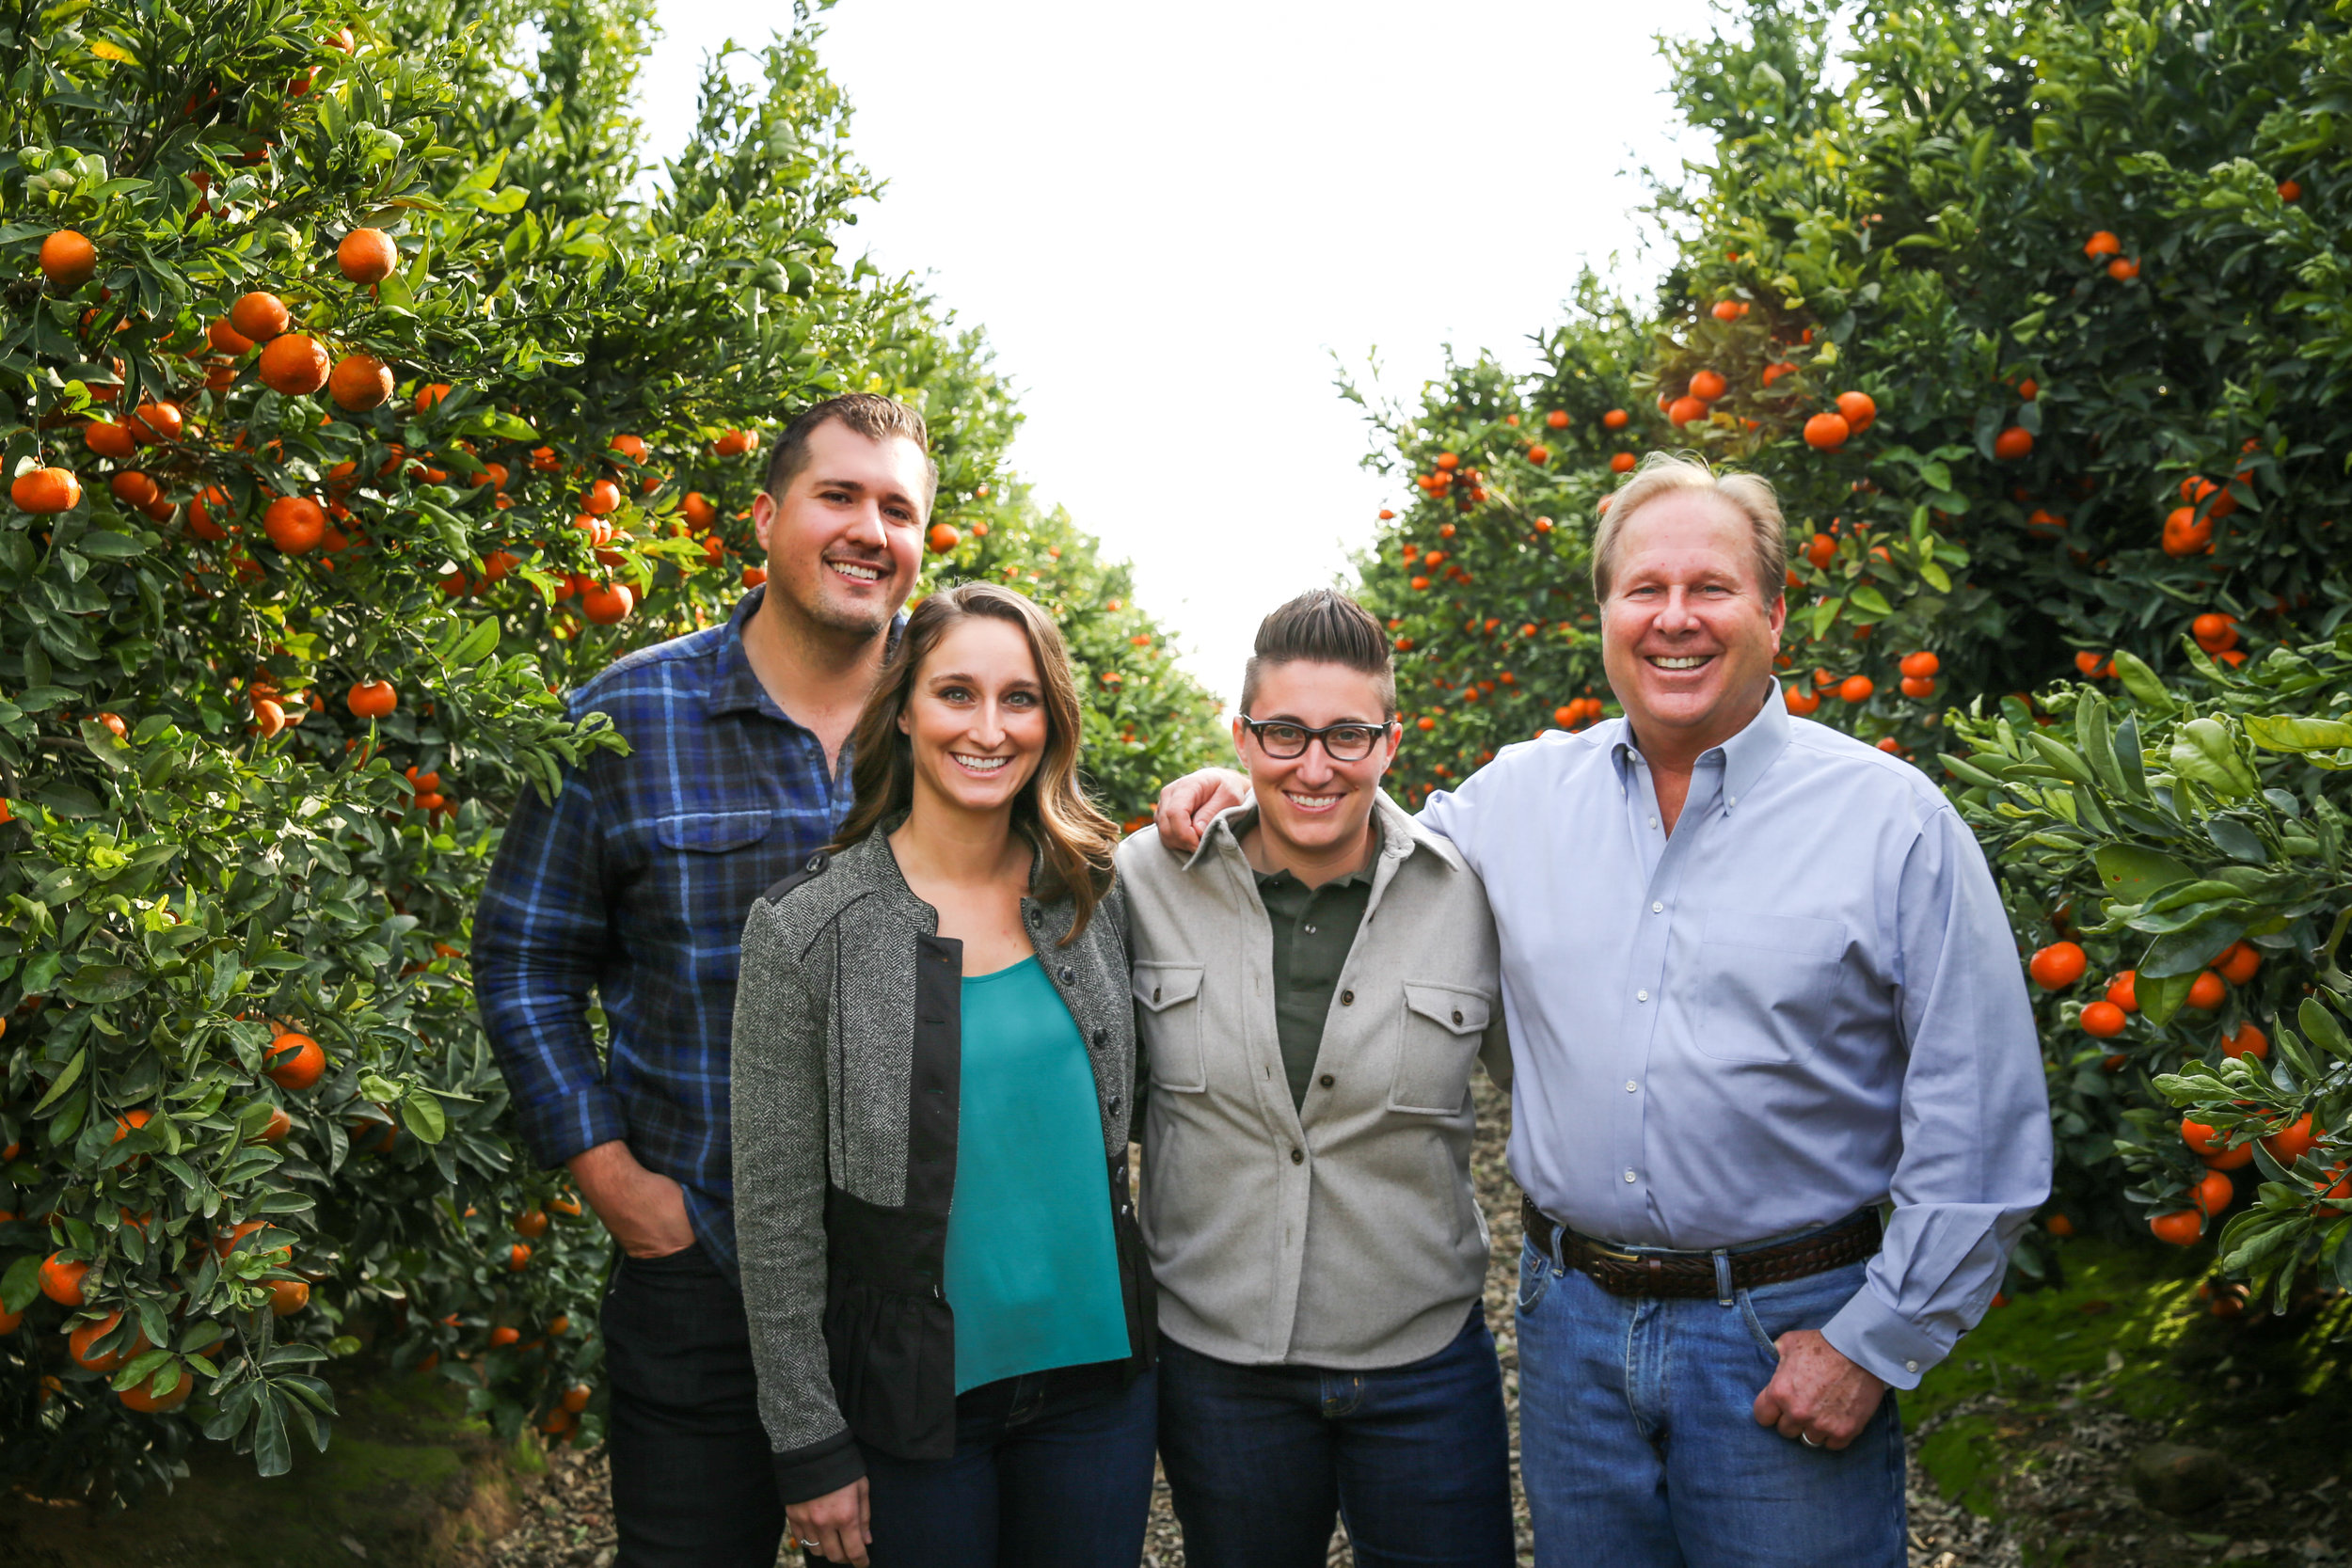 The family and team behind Fruit World (left to right): CJ Buxman, Angelica Kaprielian, Bianca Kaprielian, Craig Kaprielian